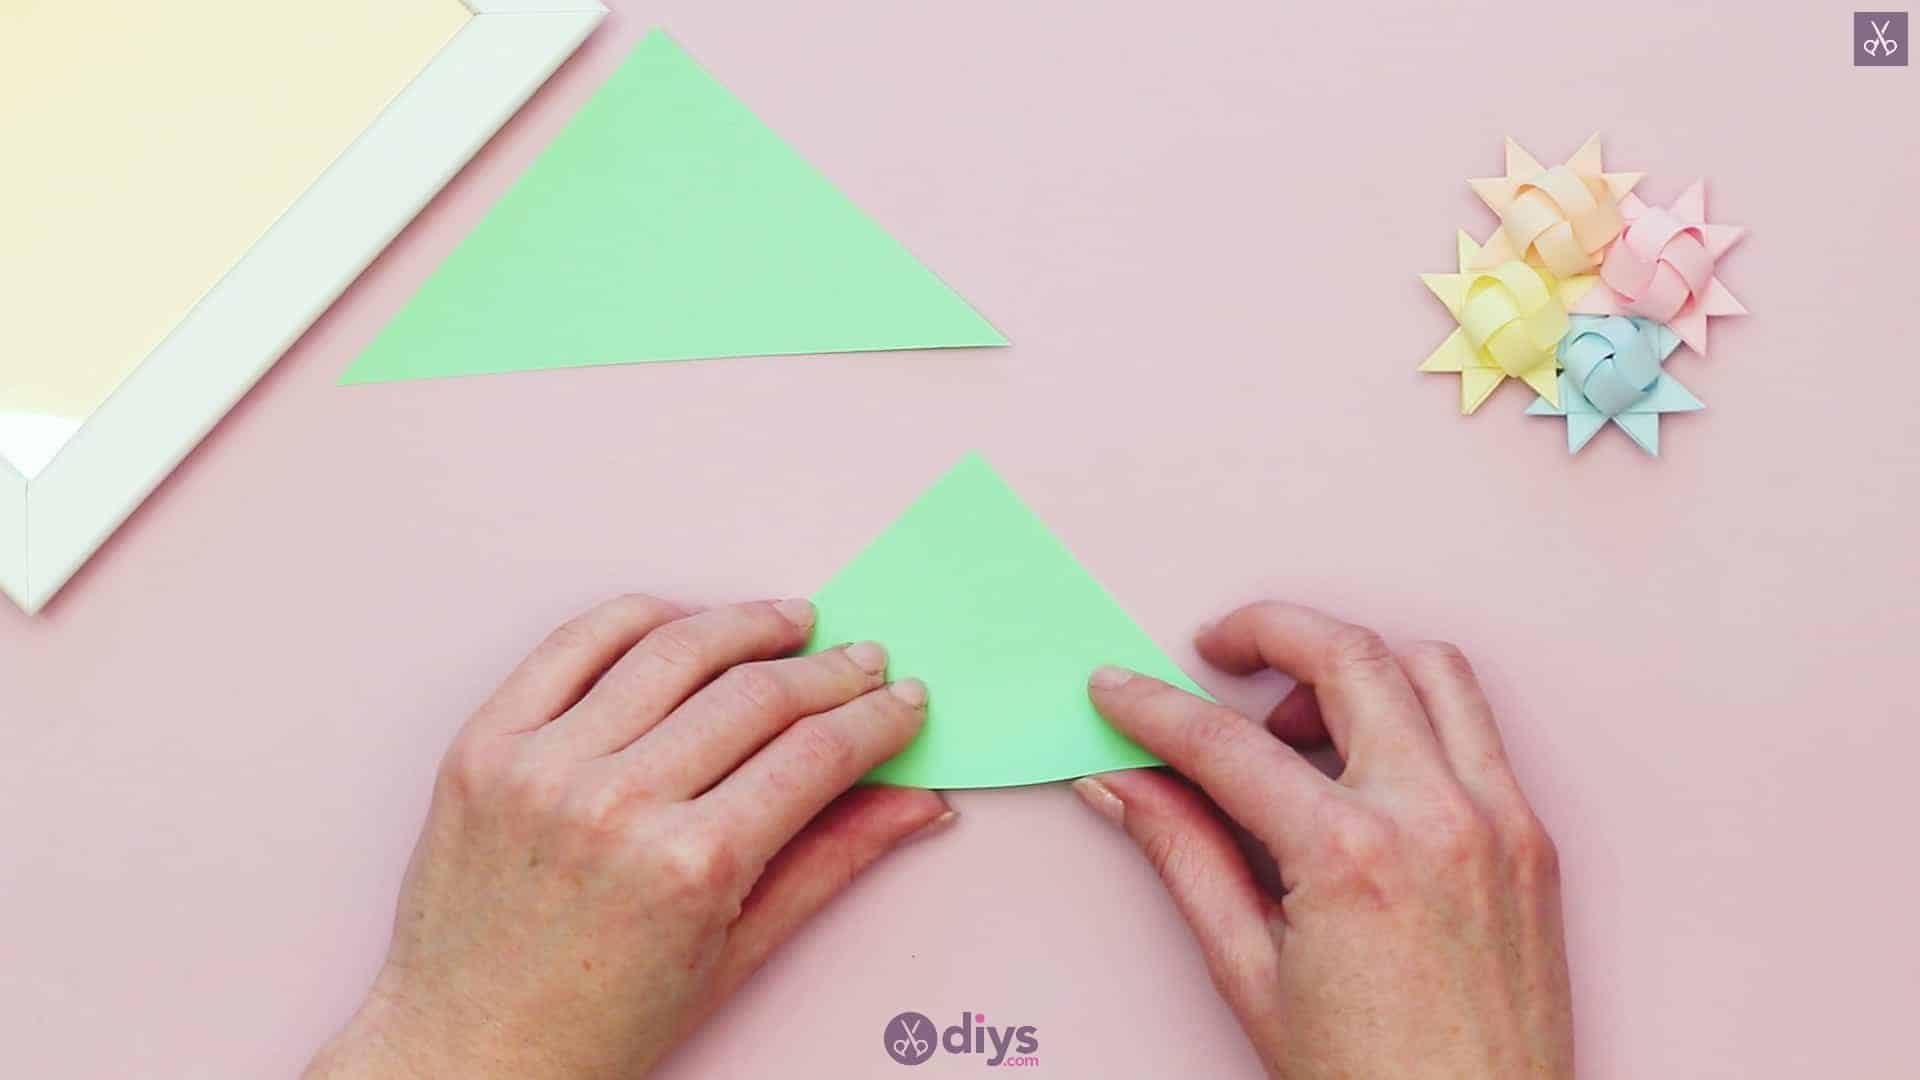 Diy origami flower art step 910